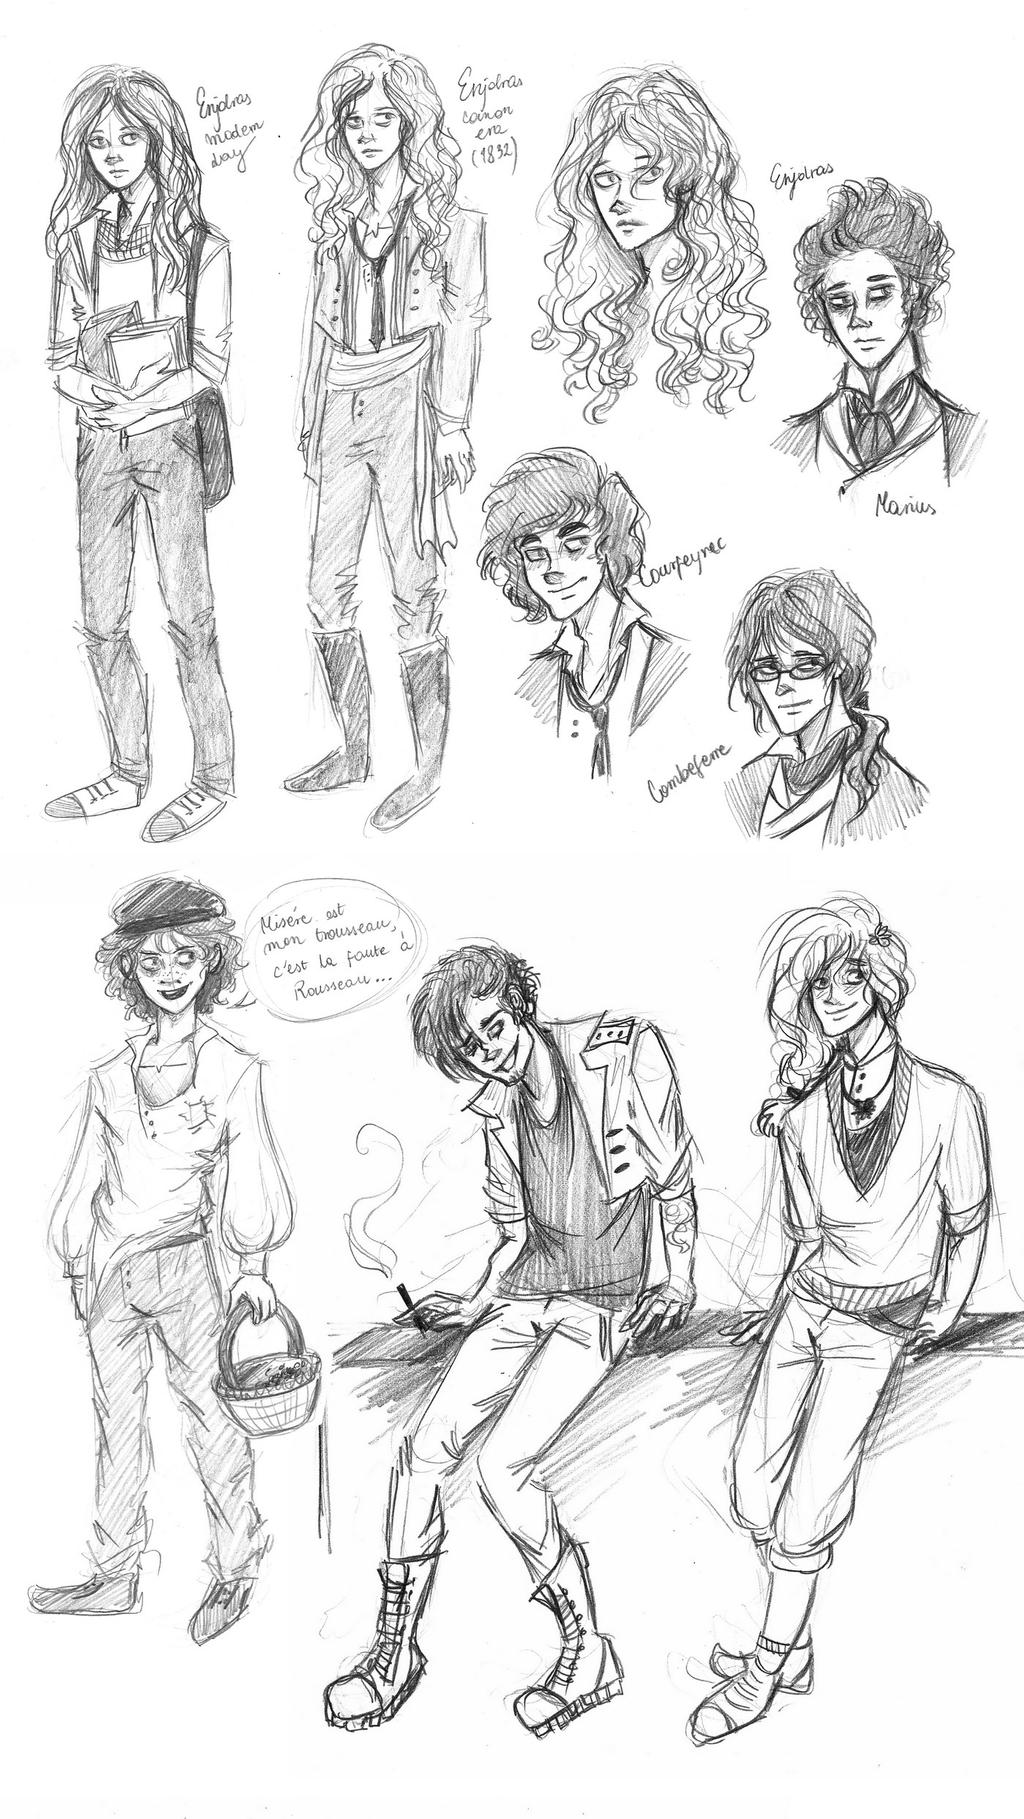 Les mis recent sketches by xxignisxx on deviantart for Les miserables coloring pages